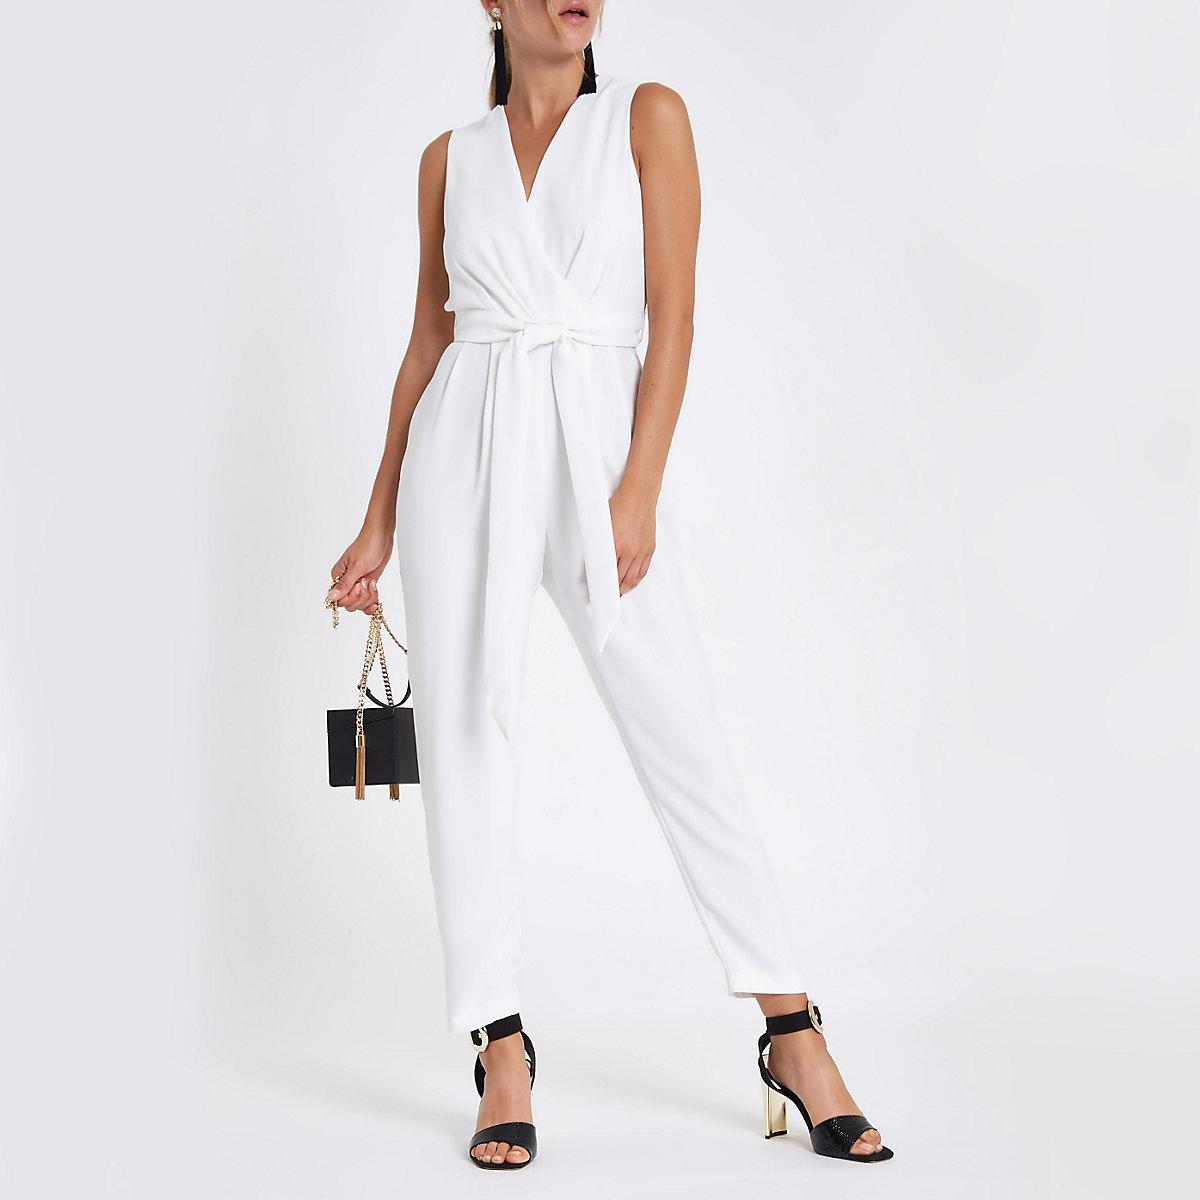 712edae1f180 White wrap front tie waist jumpsuit White wrap front tie waist jumpsuit ...